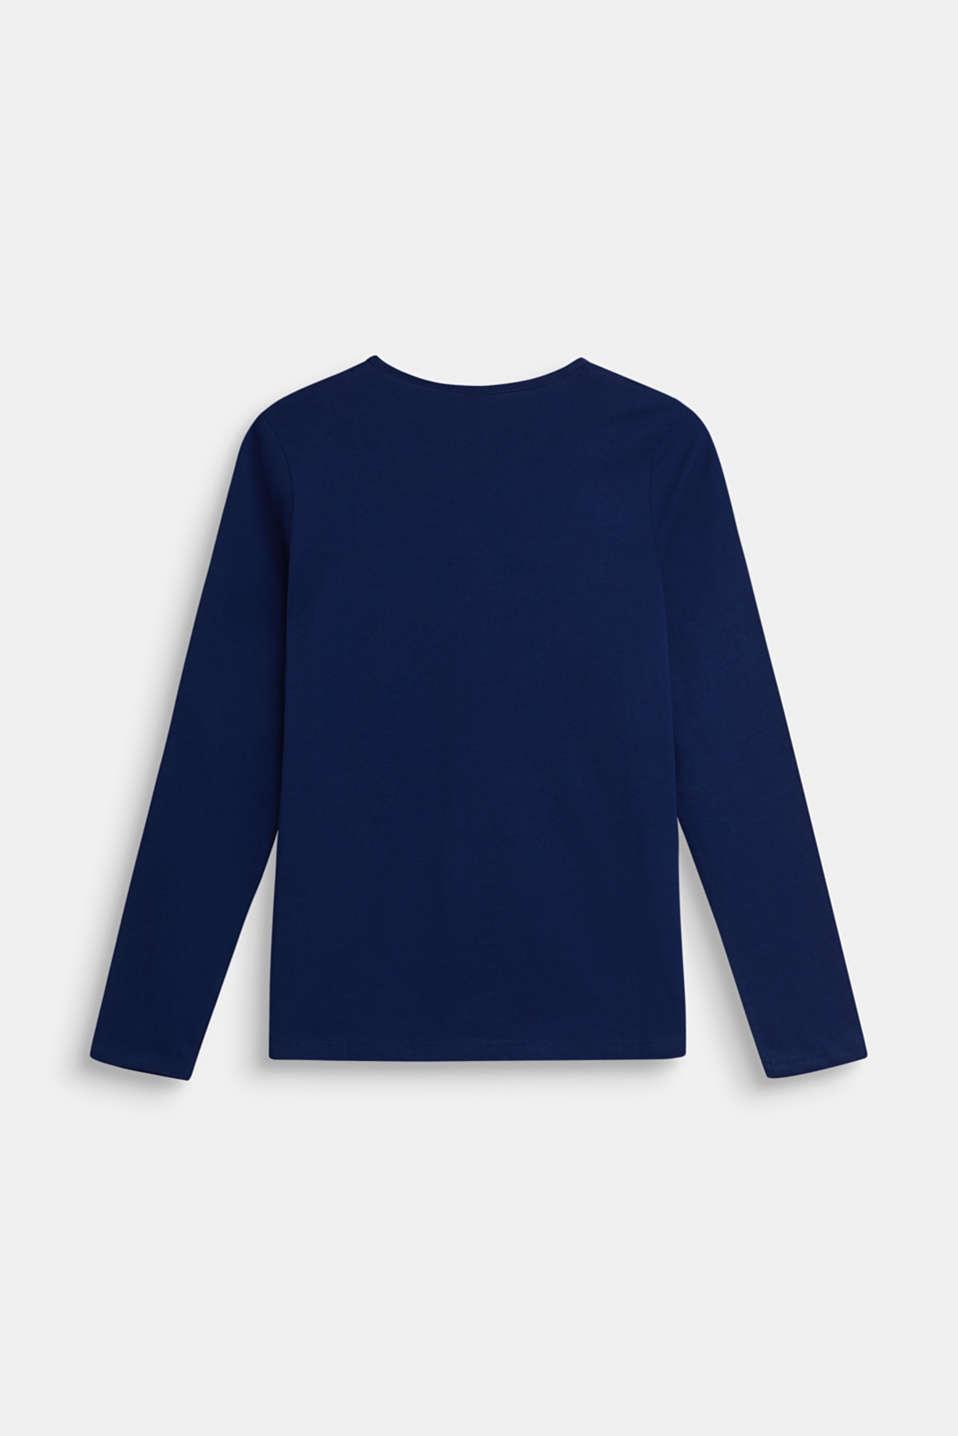 T-Shirts, LCMARINE BLUE, detail image number 1